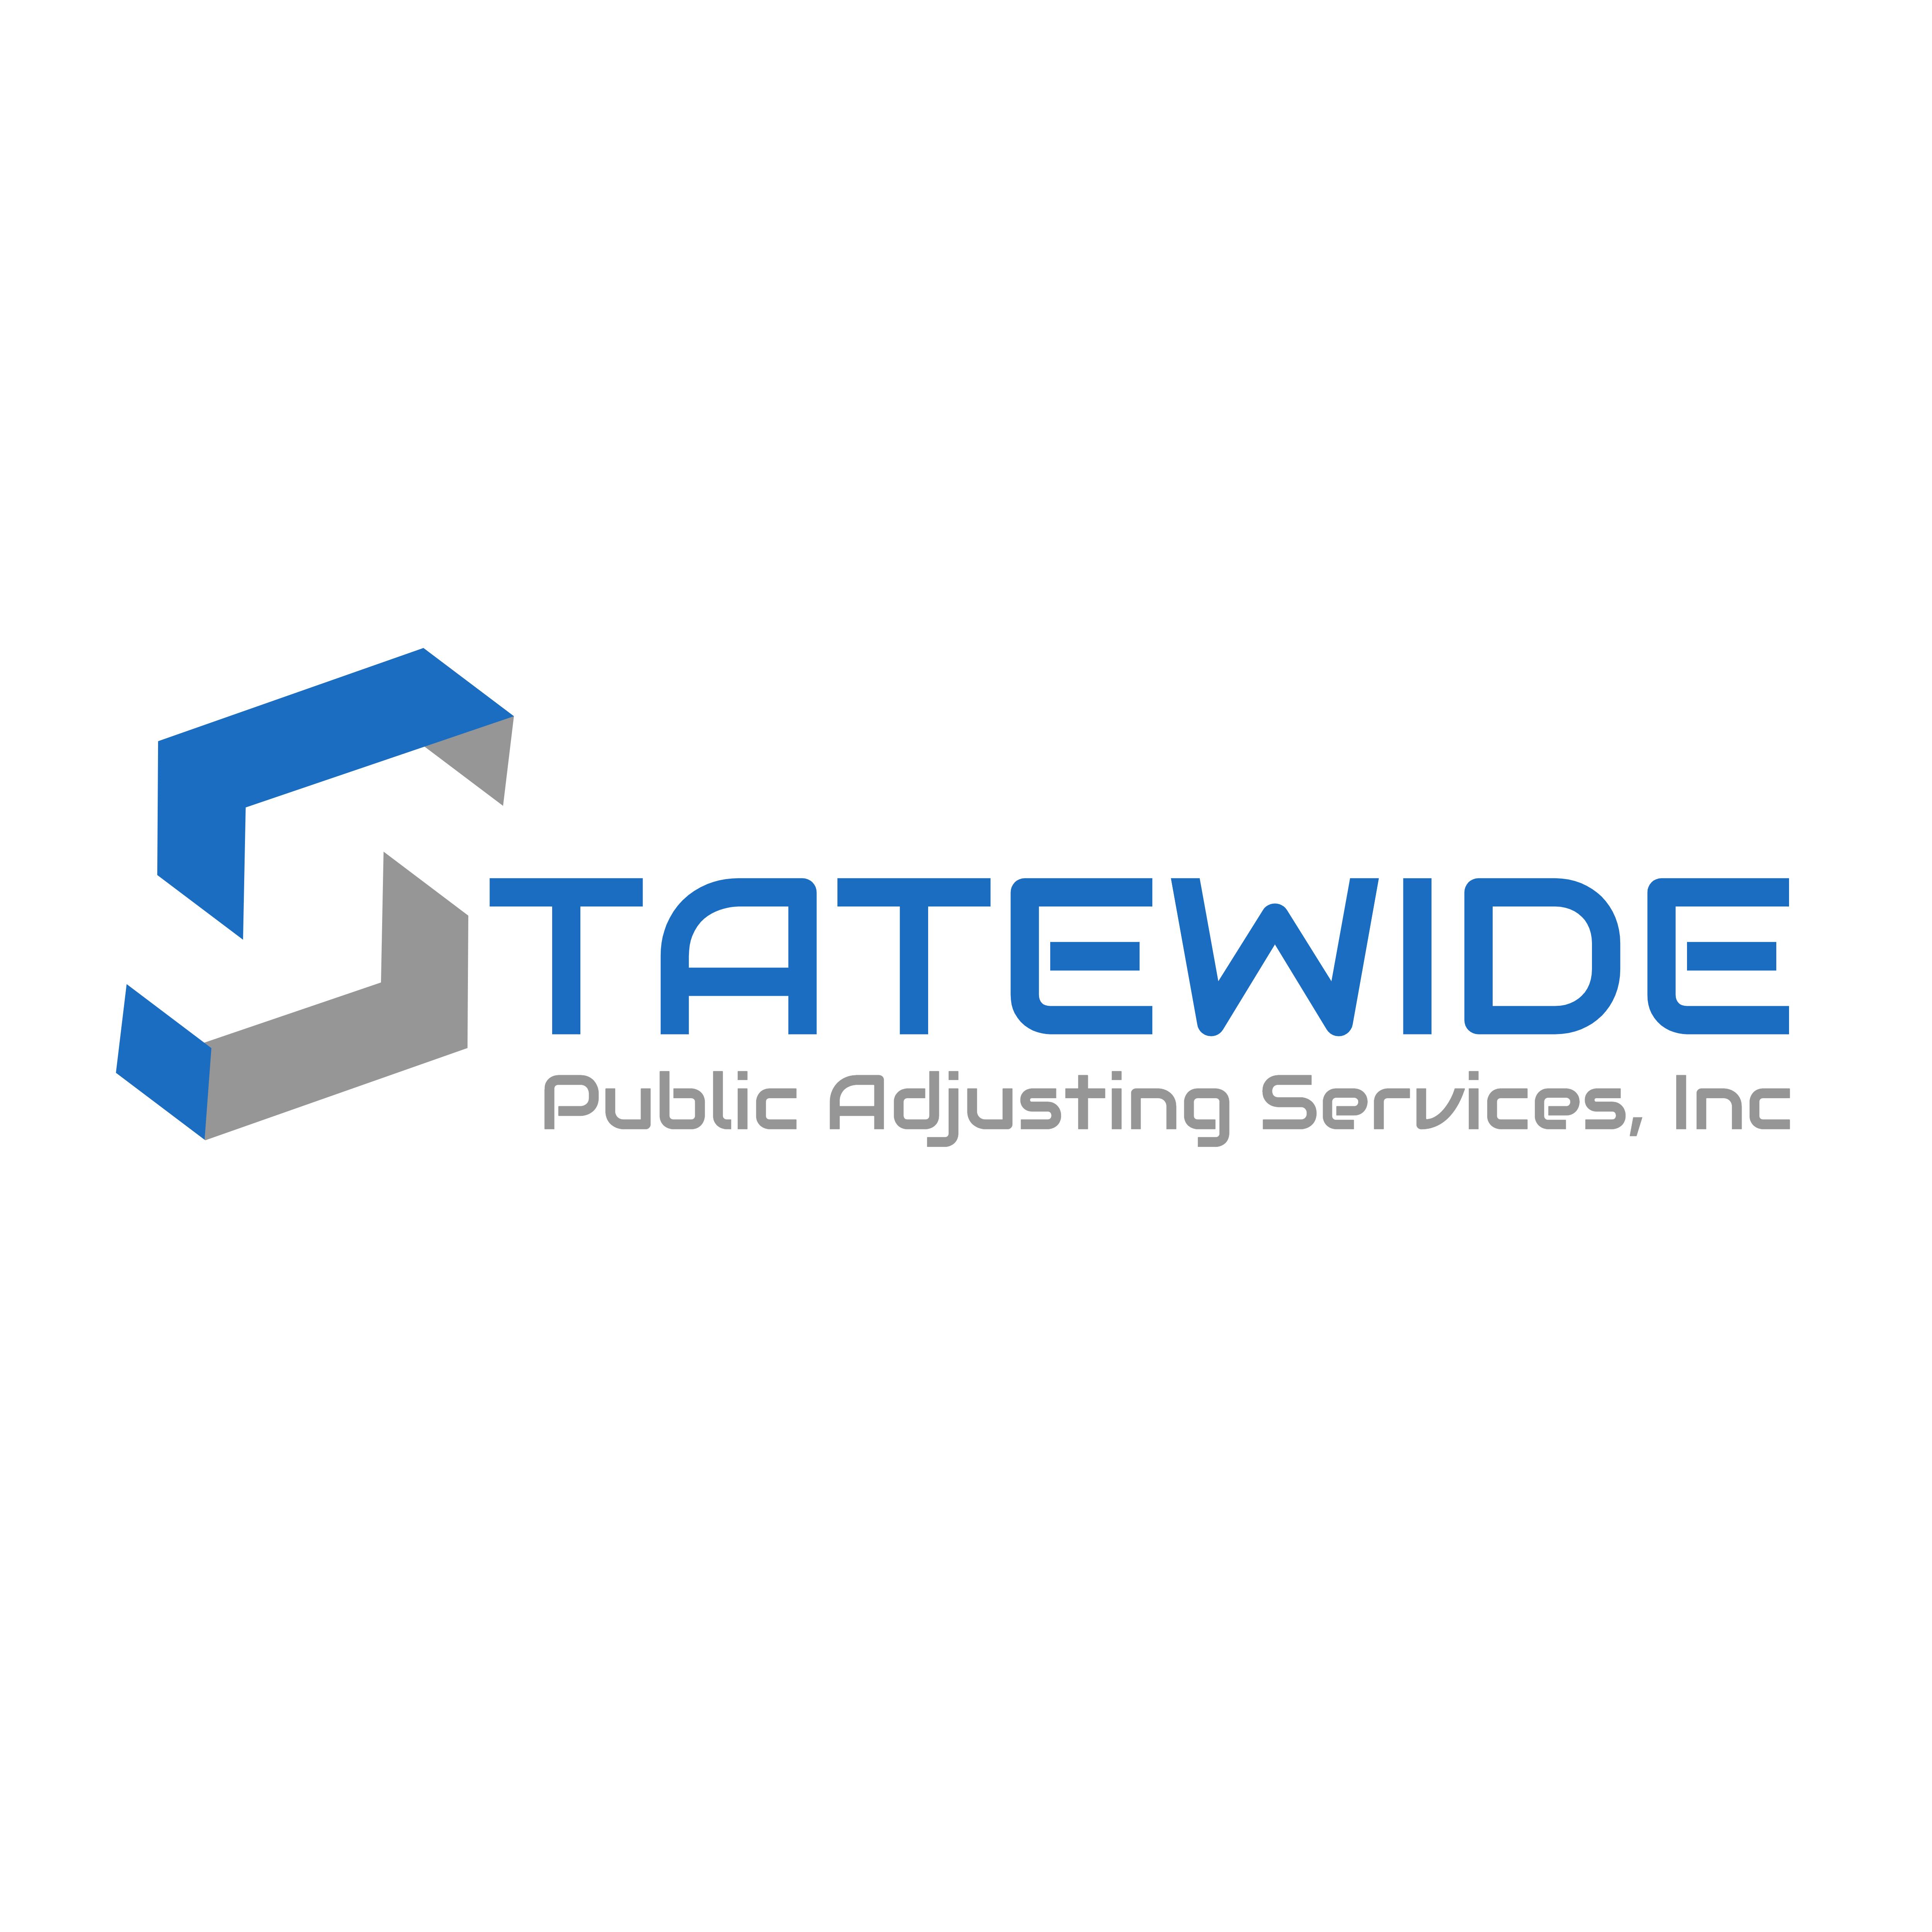 Statewide Public Adjusting Services